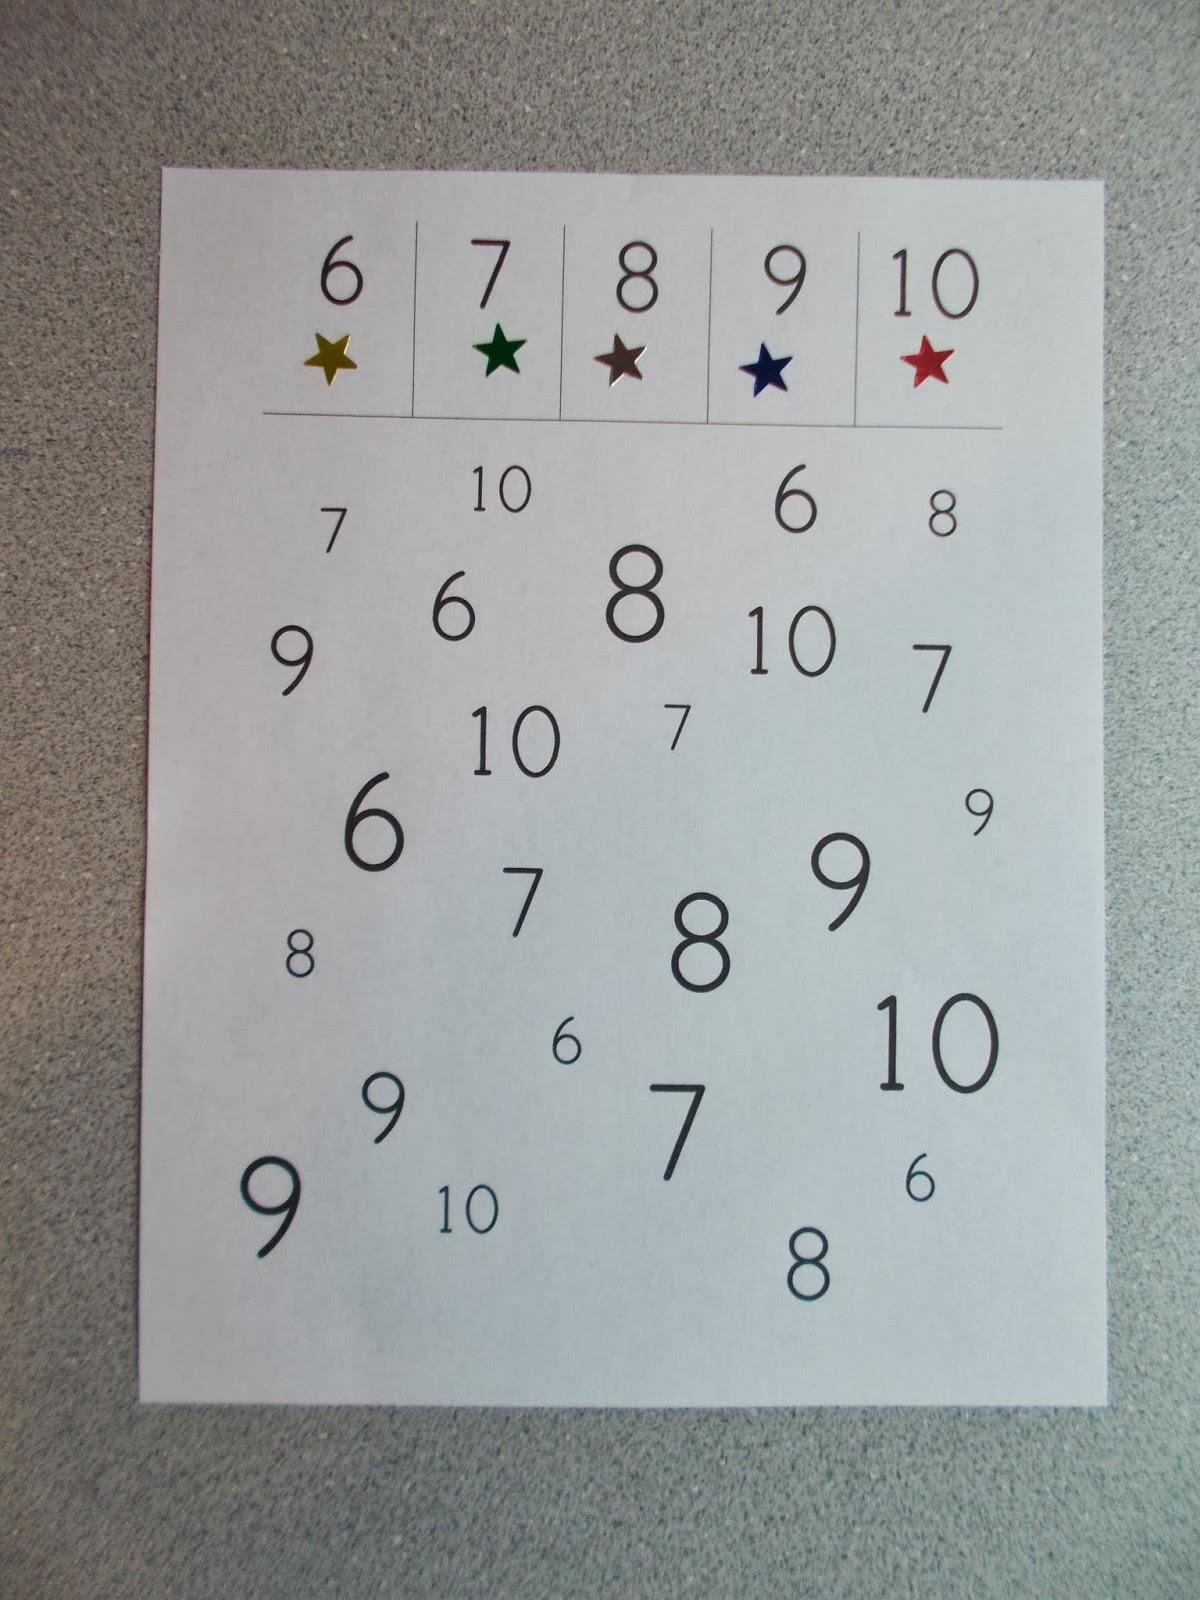 Chipman\'s Corner Preschool: Number Search